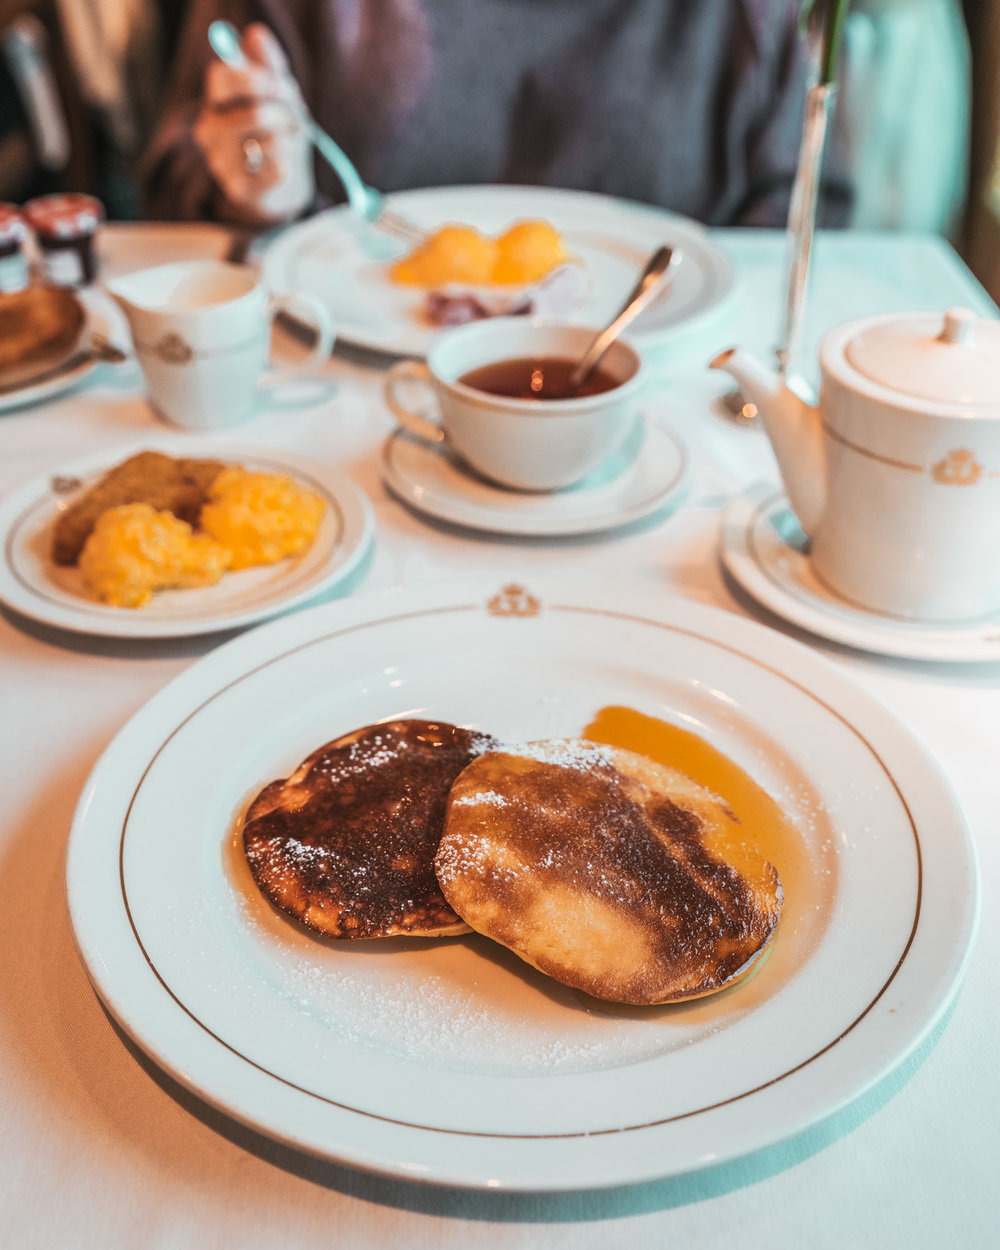 Britannia dining room breakfast // Transatlantic Cruising on the Cunard Queen Mary 2 #readysetjetset